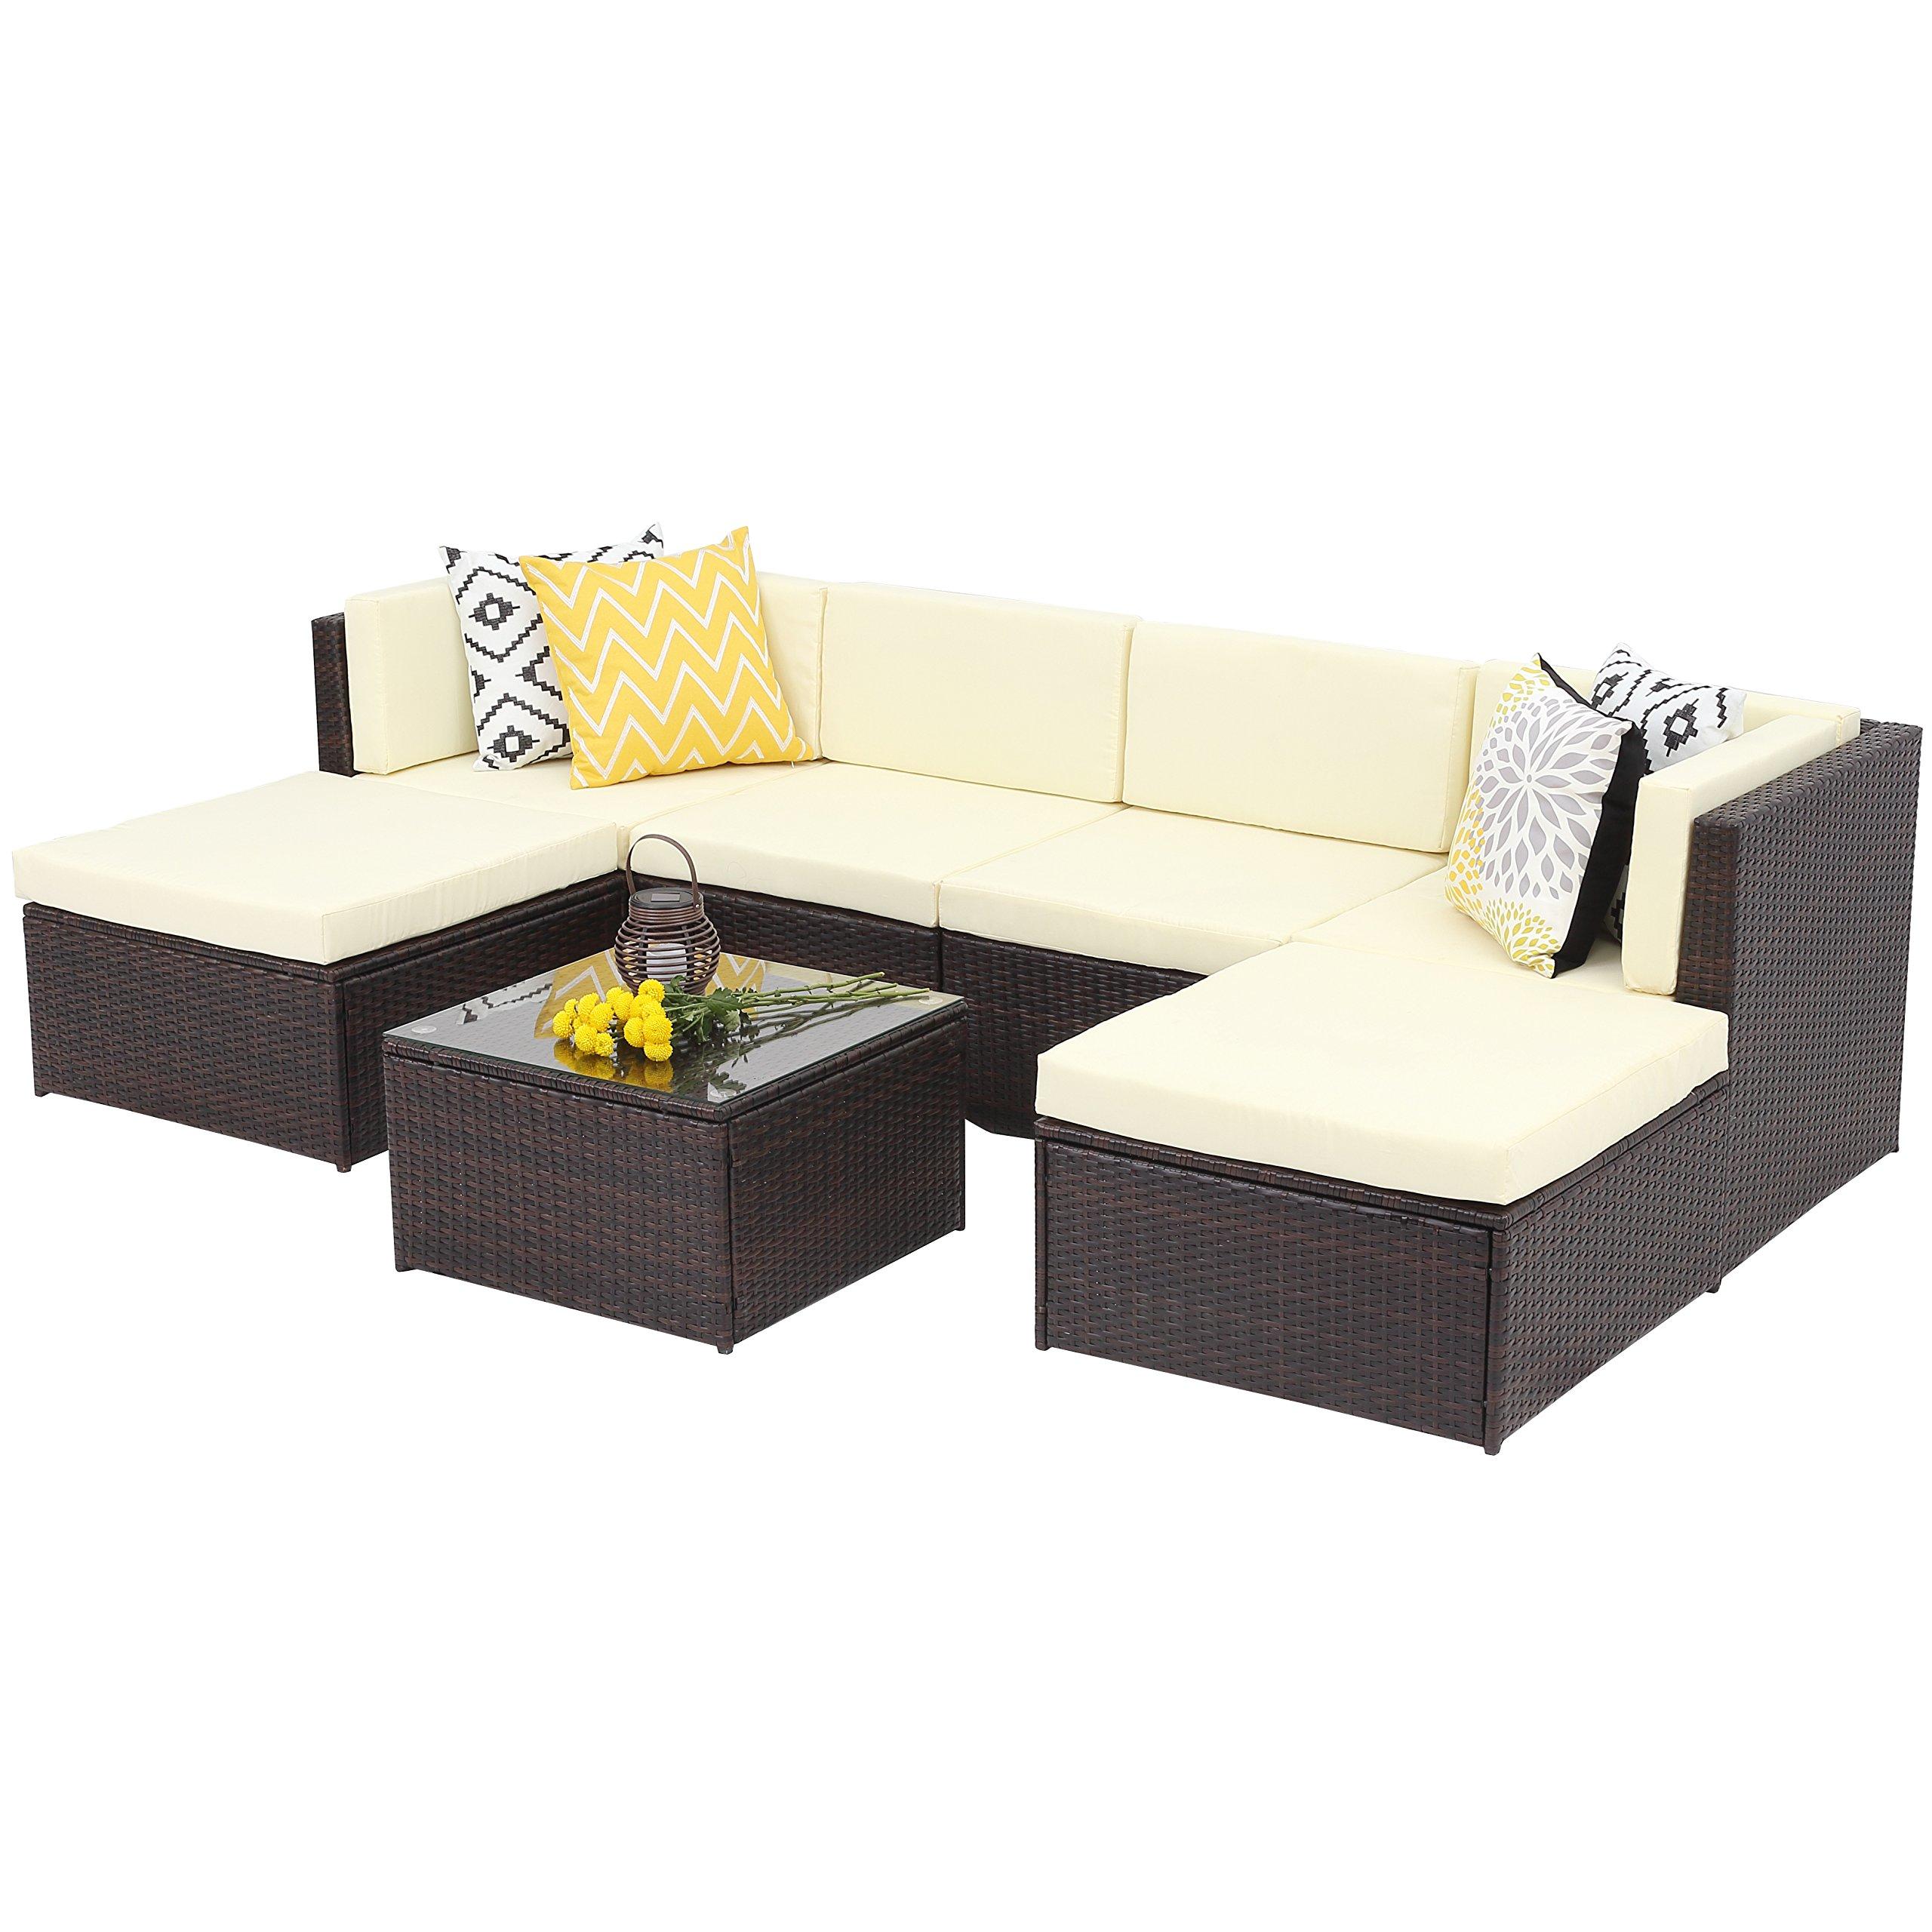 7 Piece Outdoor Patio Furniture Set, Wisteria Lane Garden Rattan Wicker Sofa Conversation Sets,Brown